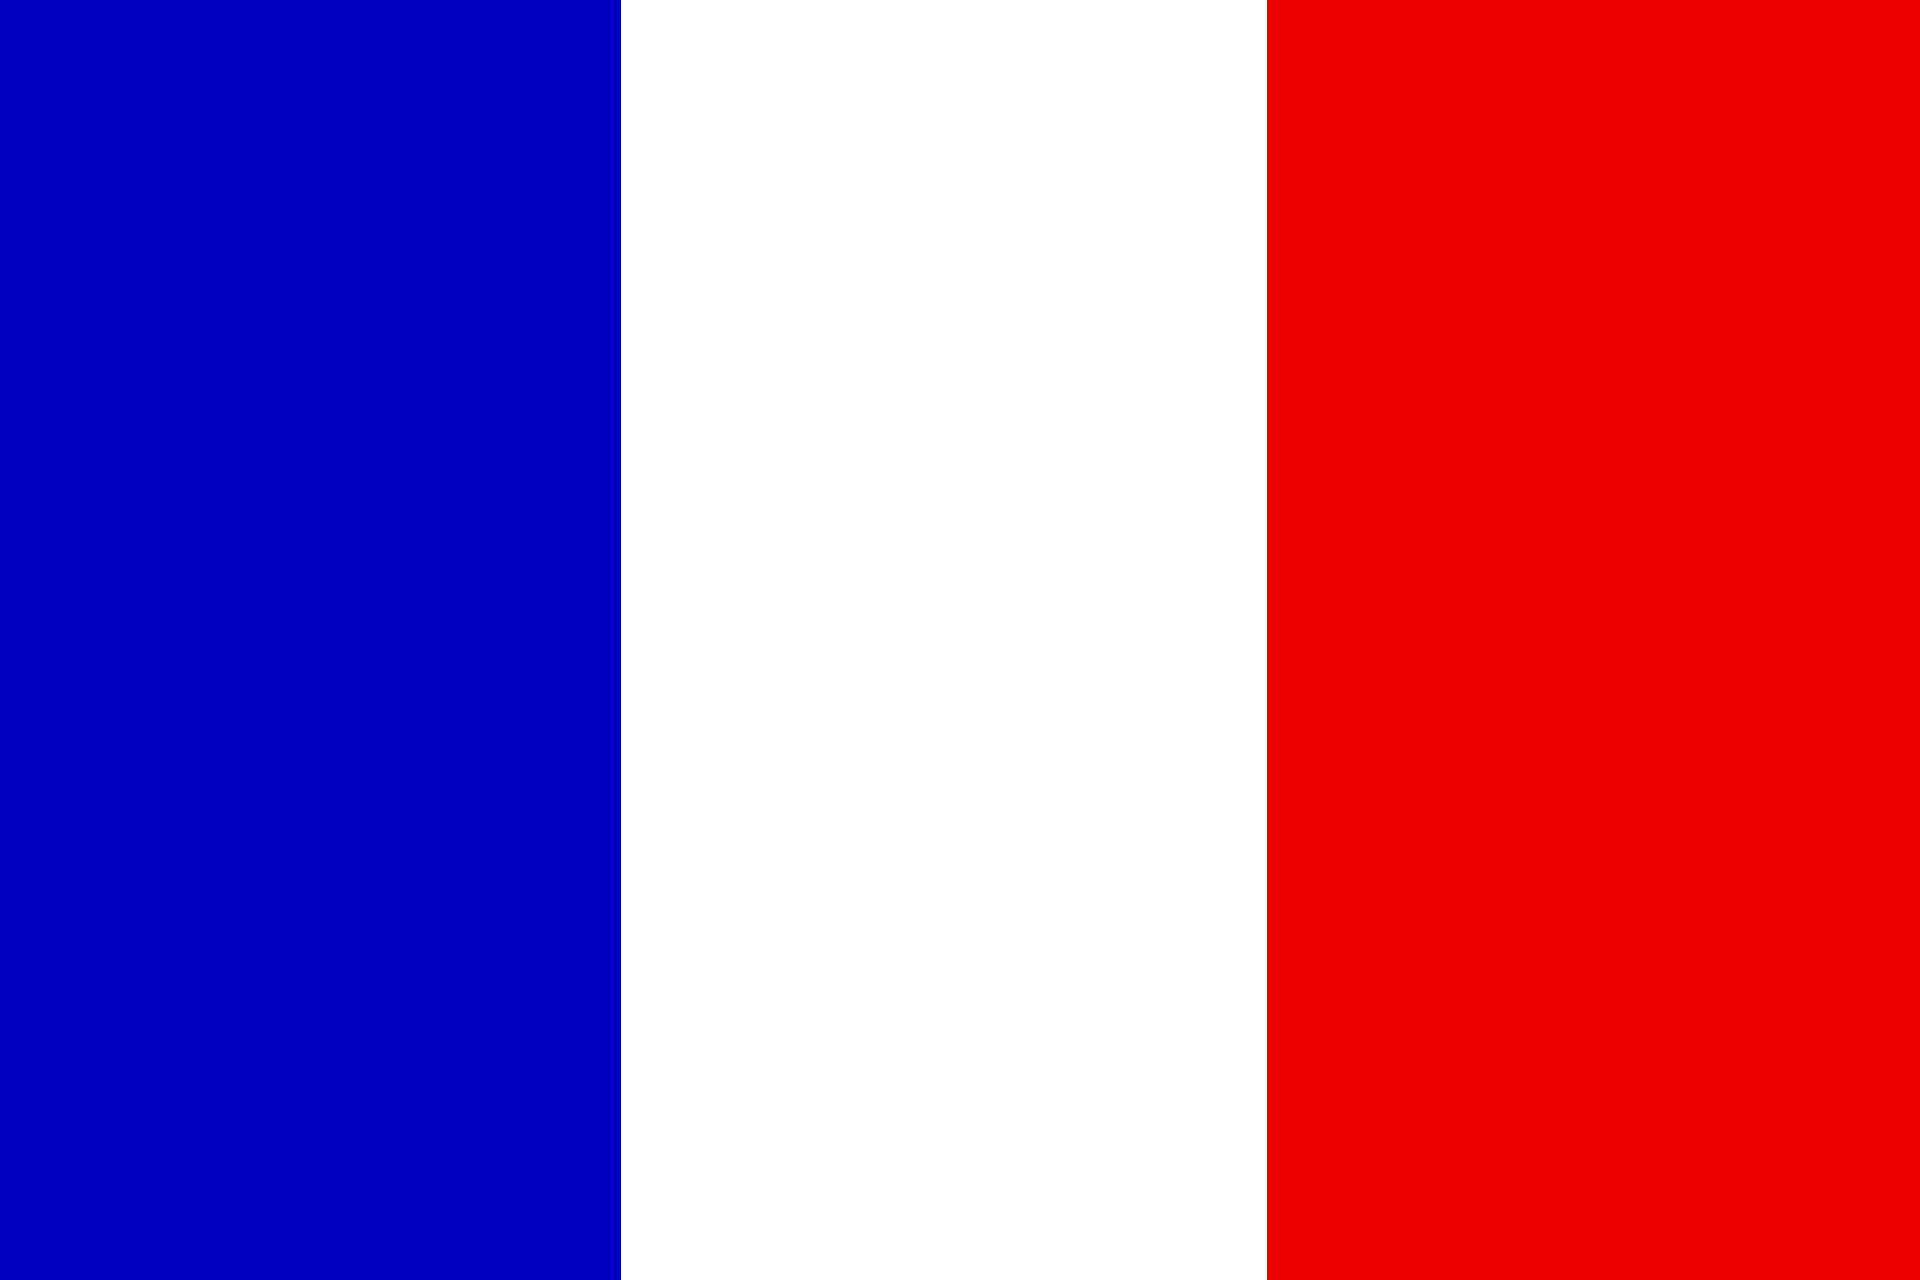 Bild Fahne Frankreich